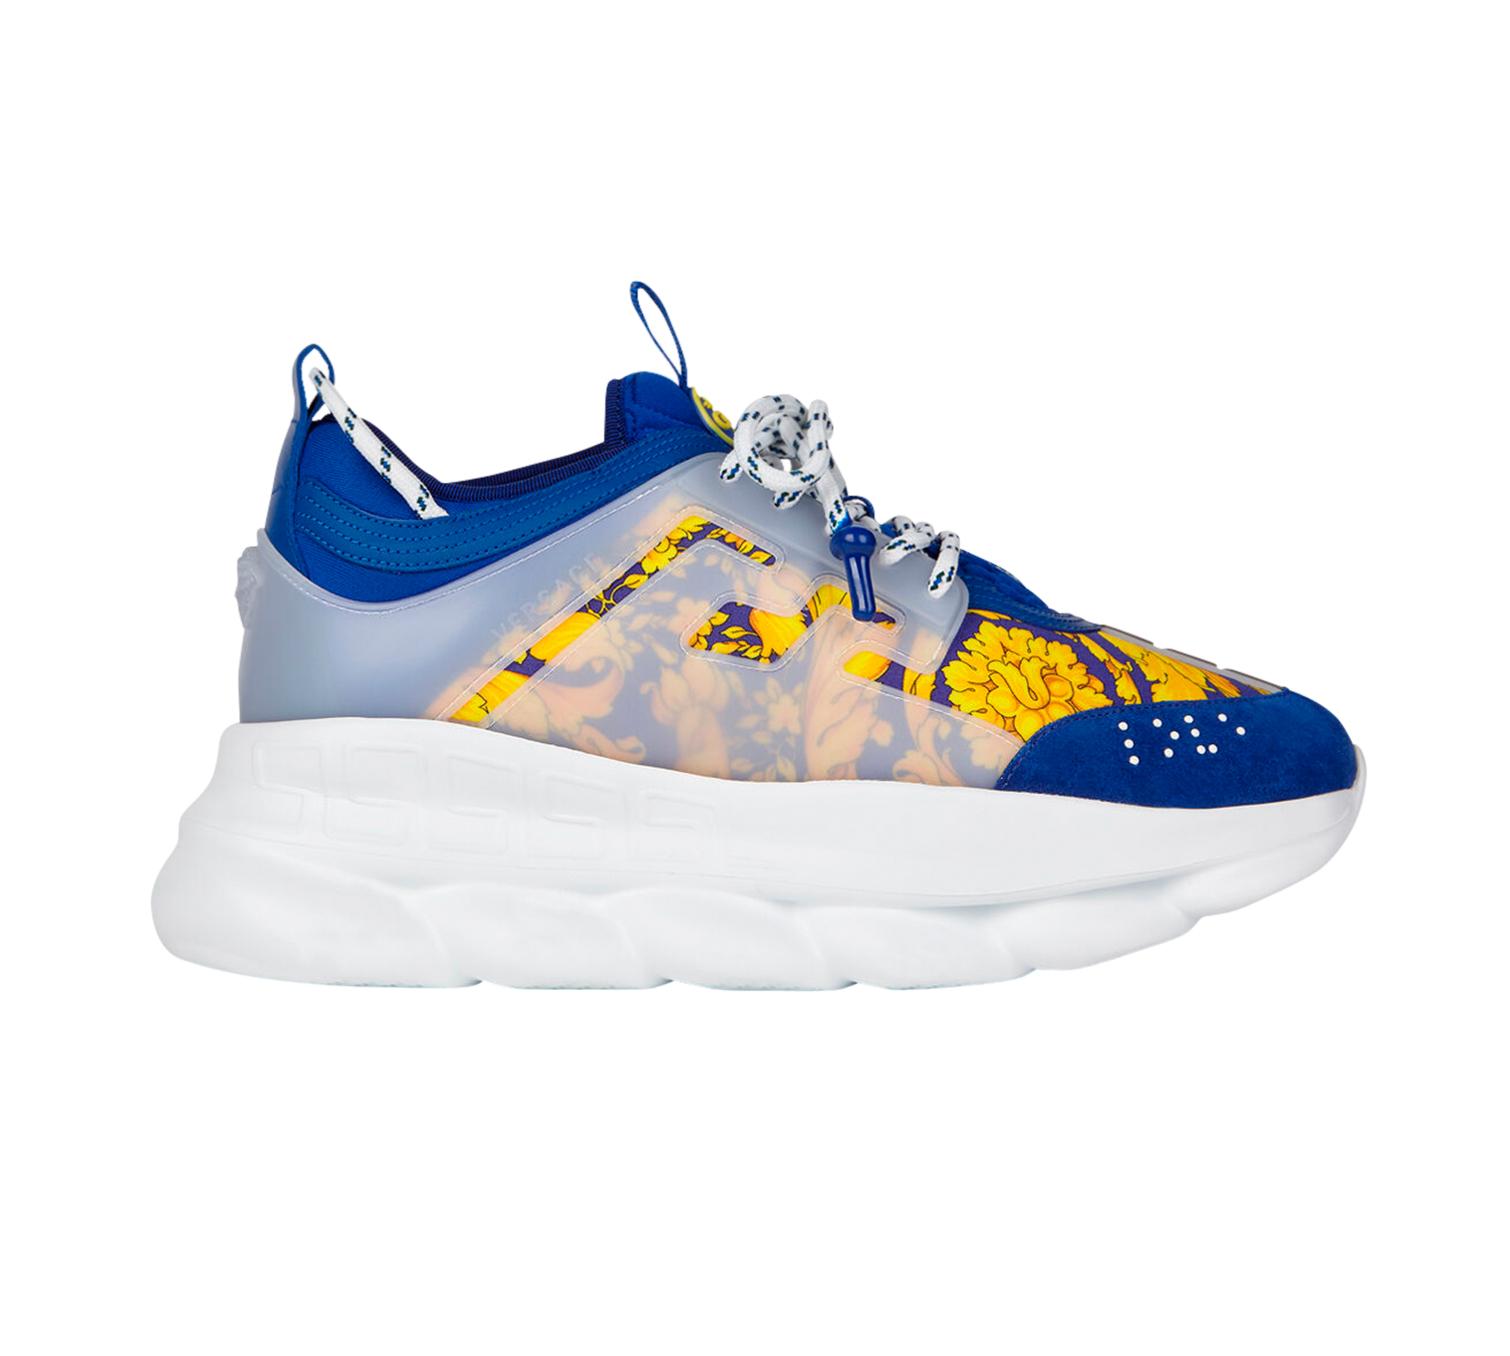 sneakers08_revistamine_interior